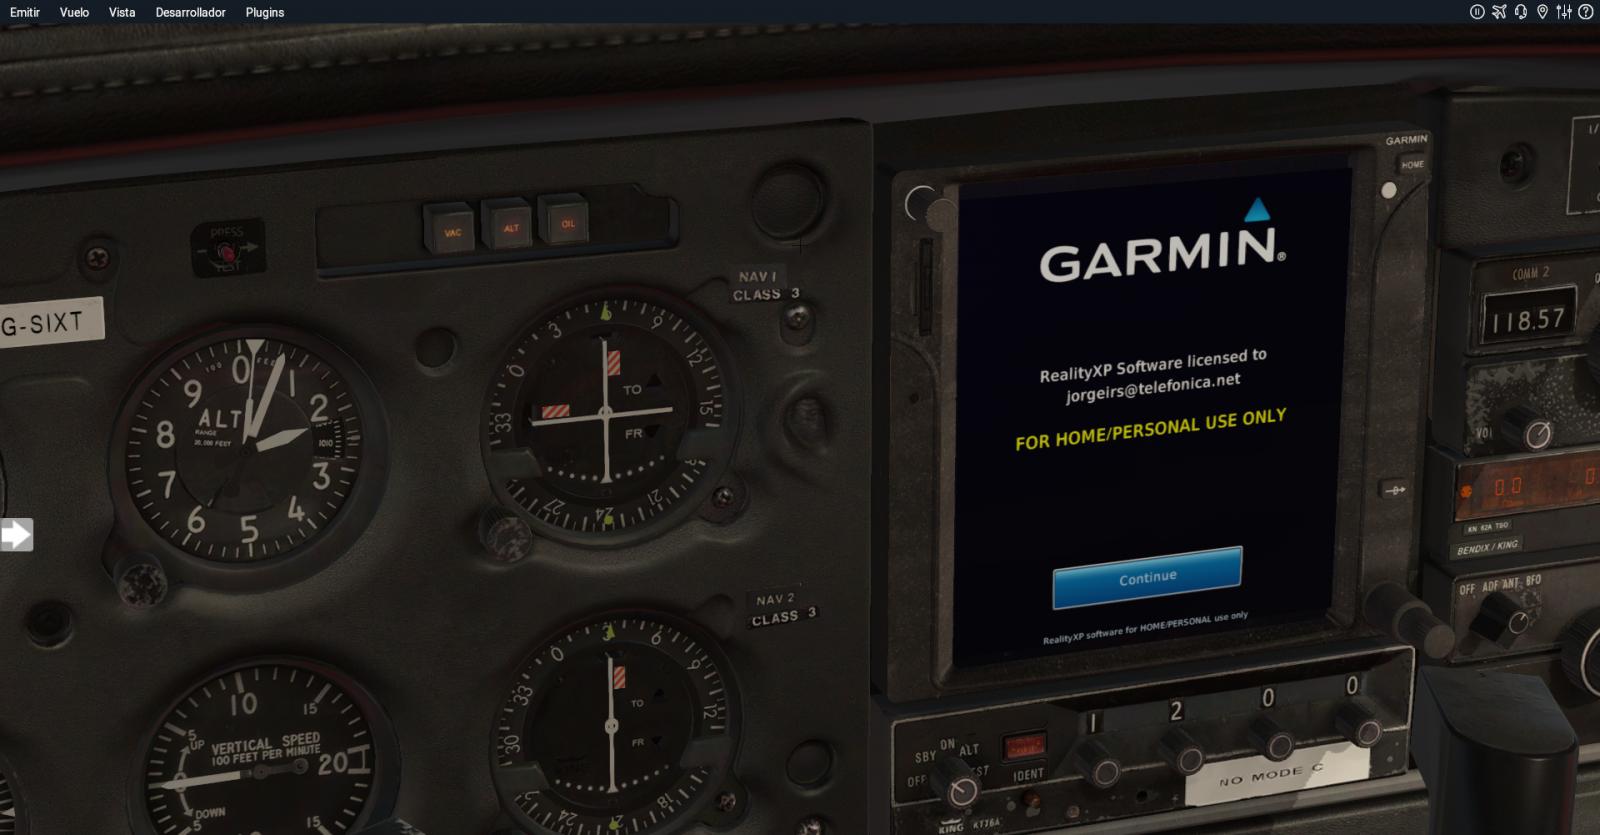 GTN 750 not work - Just Flight PA28 Warrior II - X-Plane Org